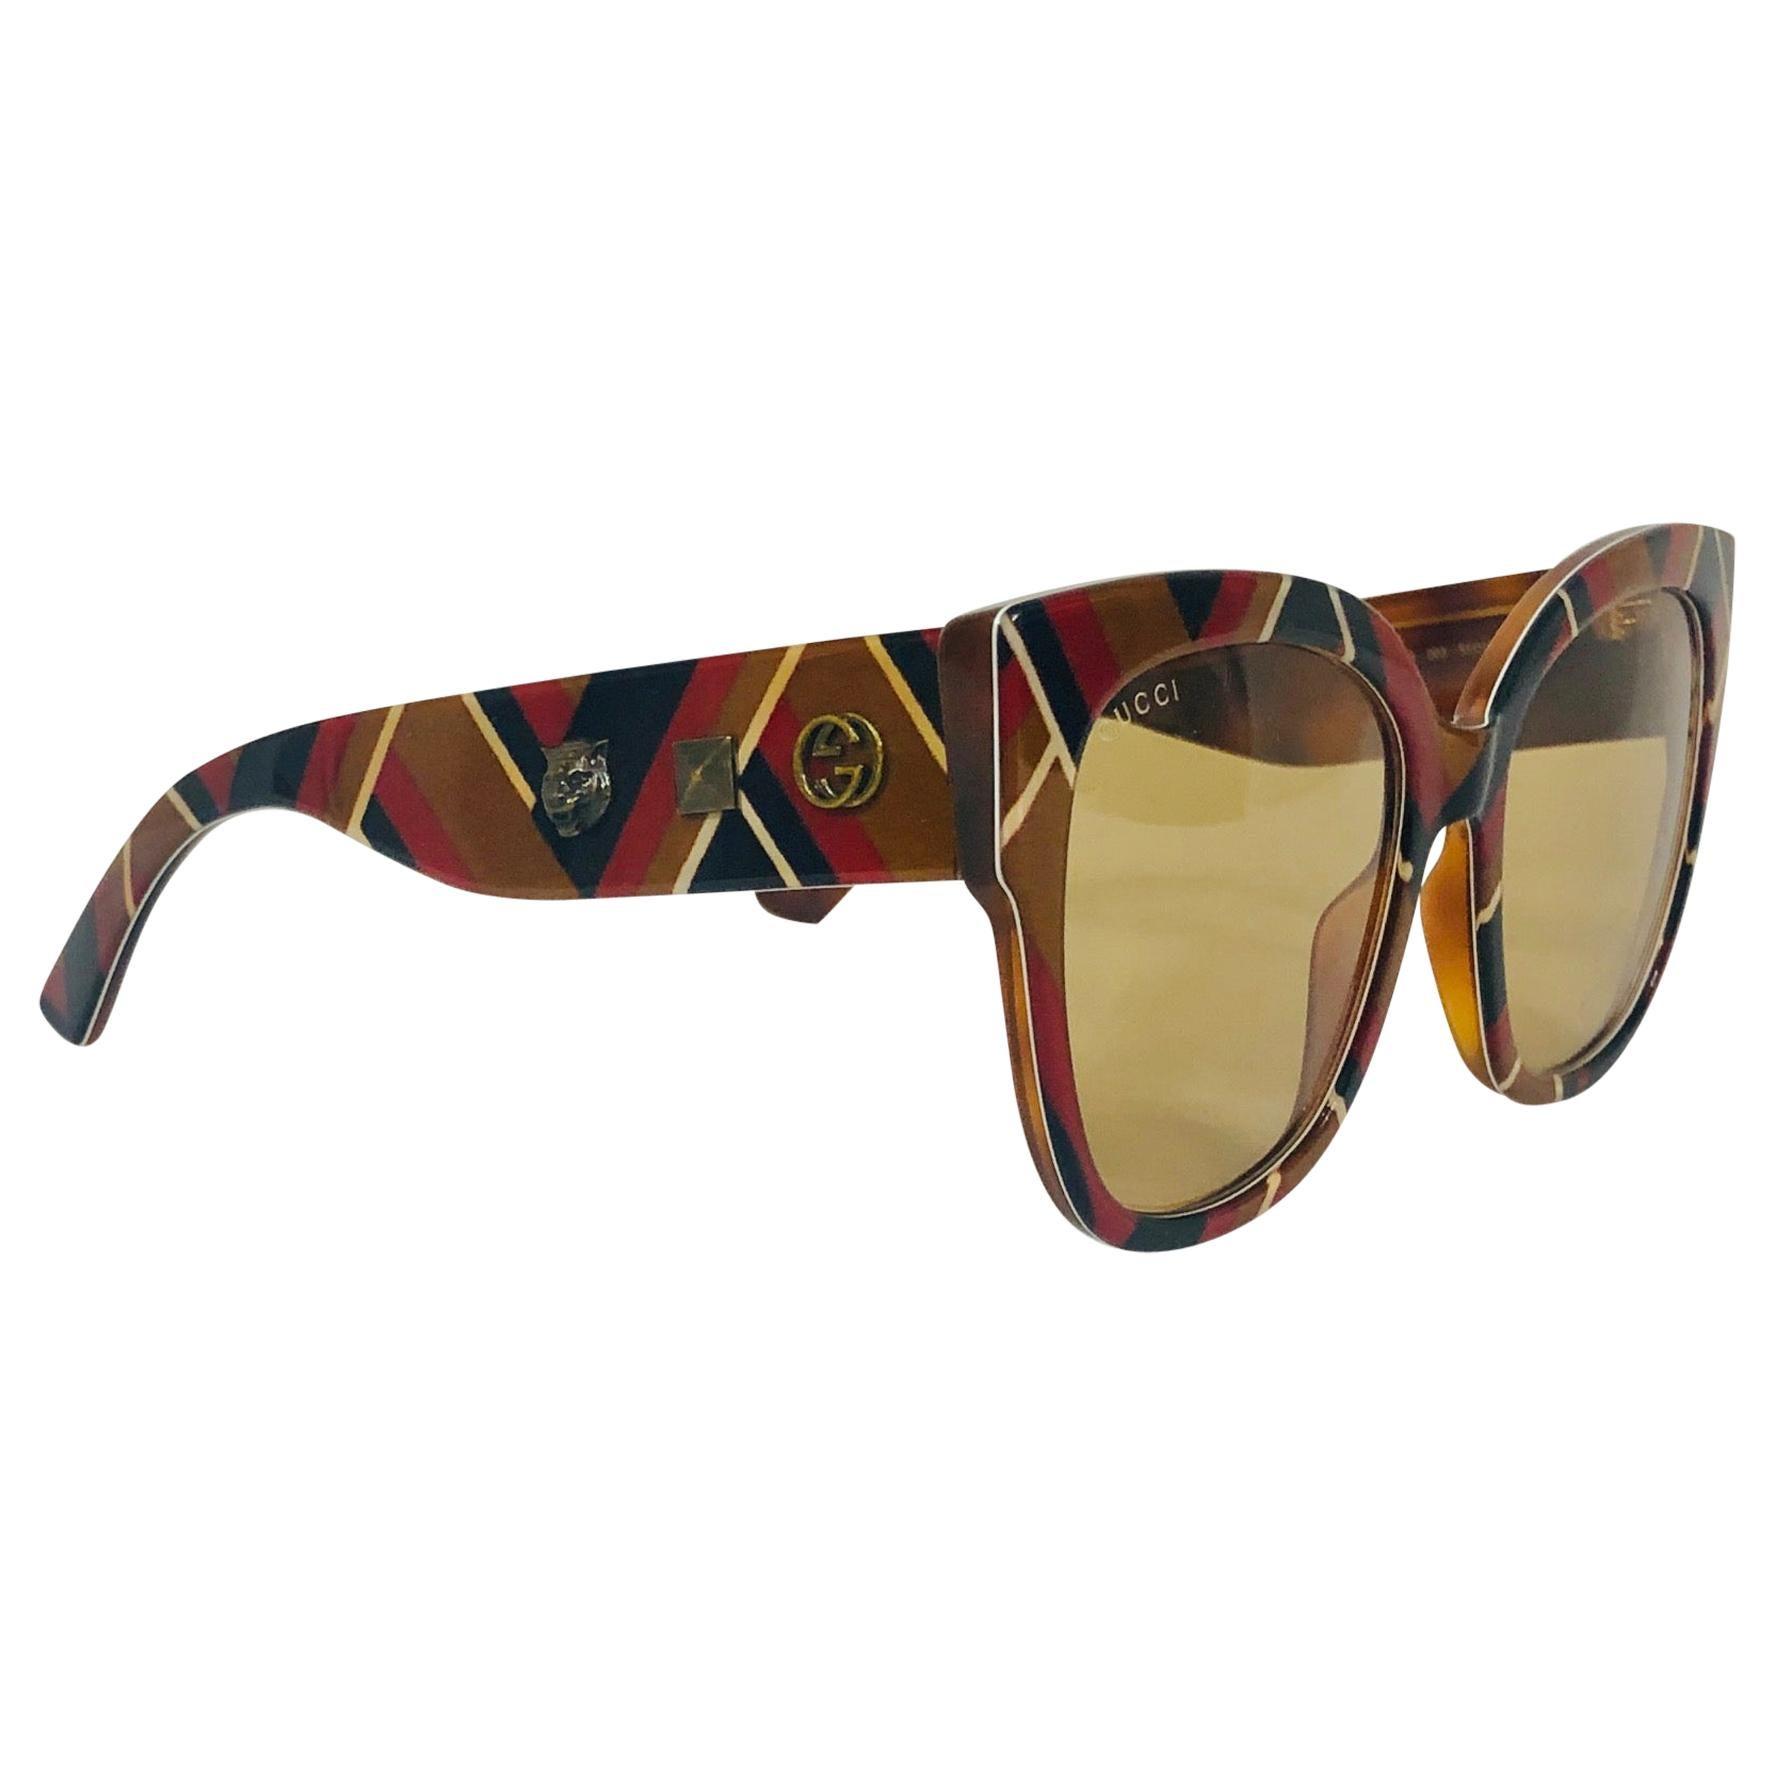 New Gucci Oversize Ladies Chevron Pattern Studded Sunglasses GG0059S 003 55